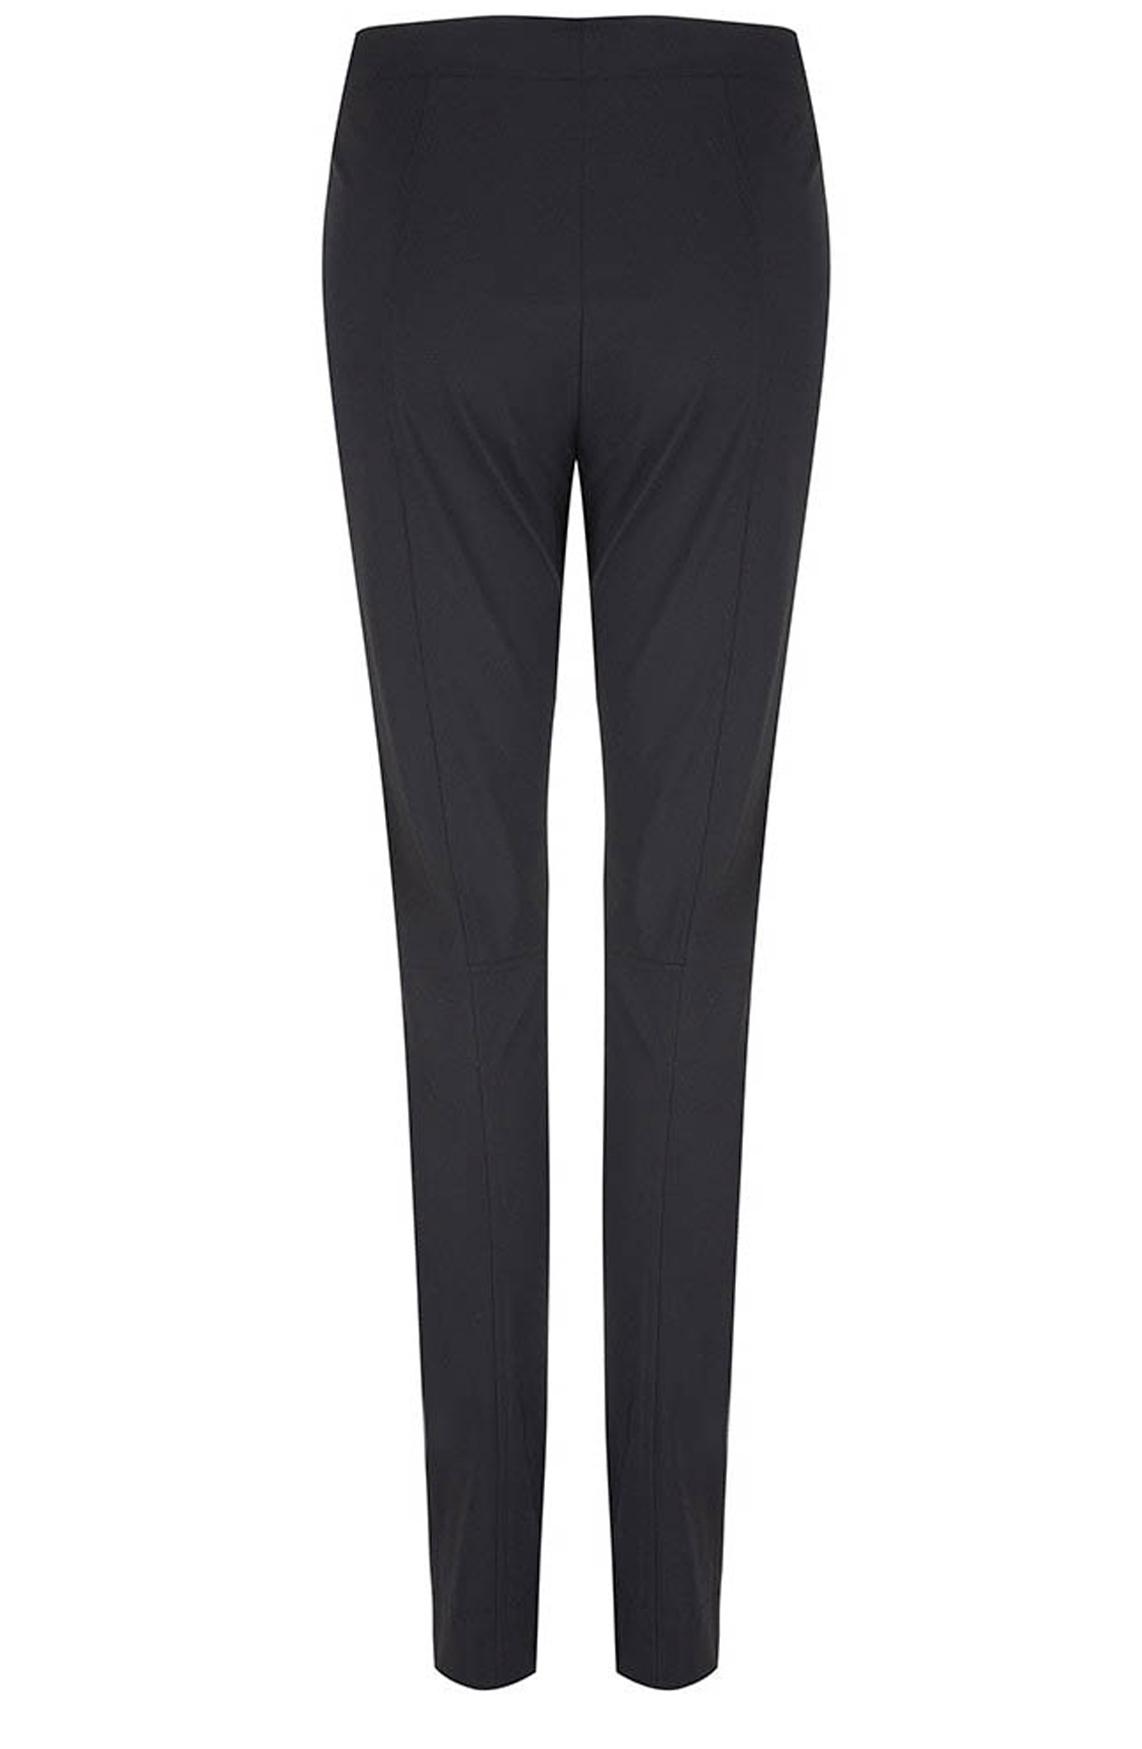 Jane Lushka Dames Jersey broek zwart